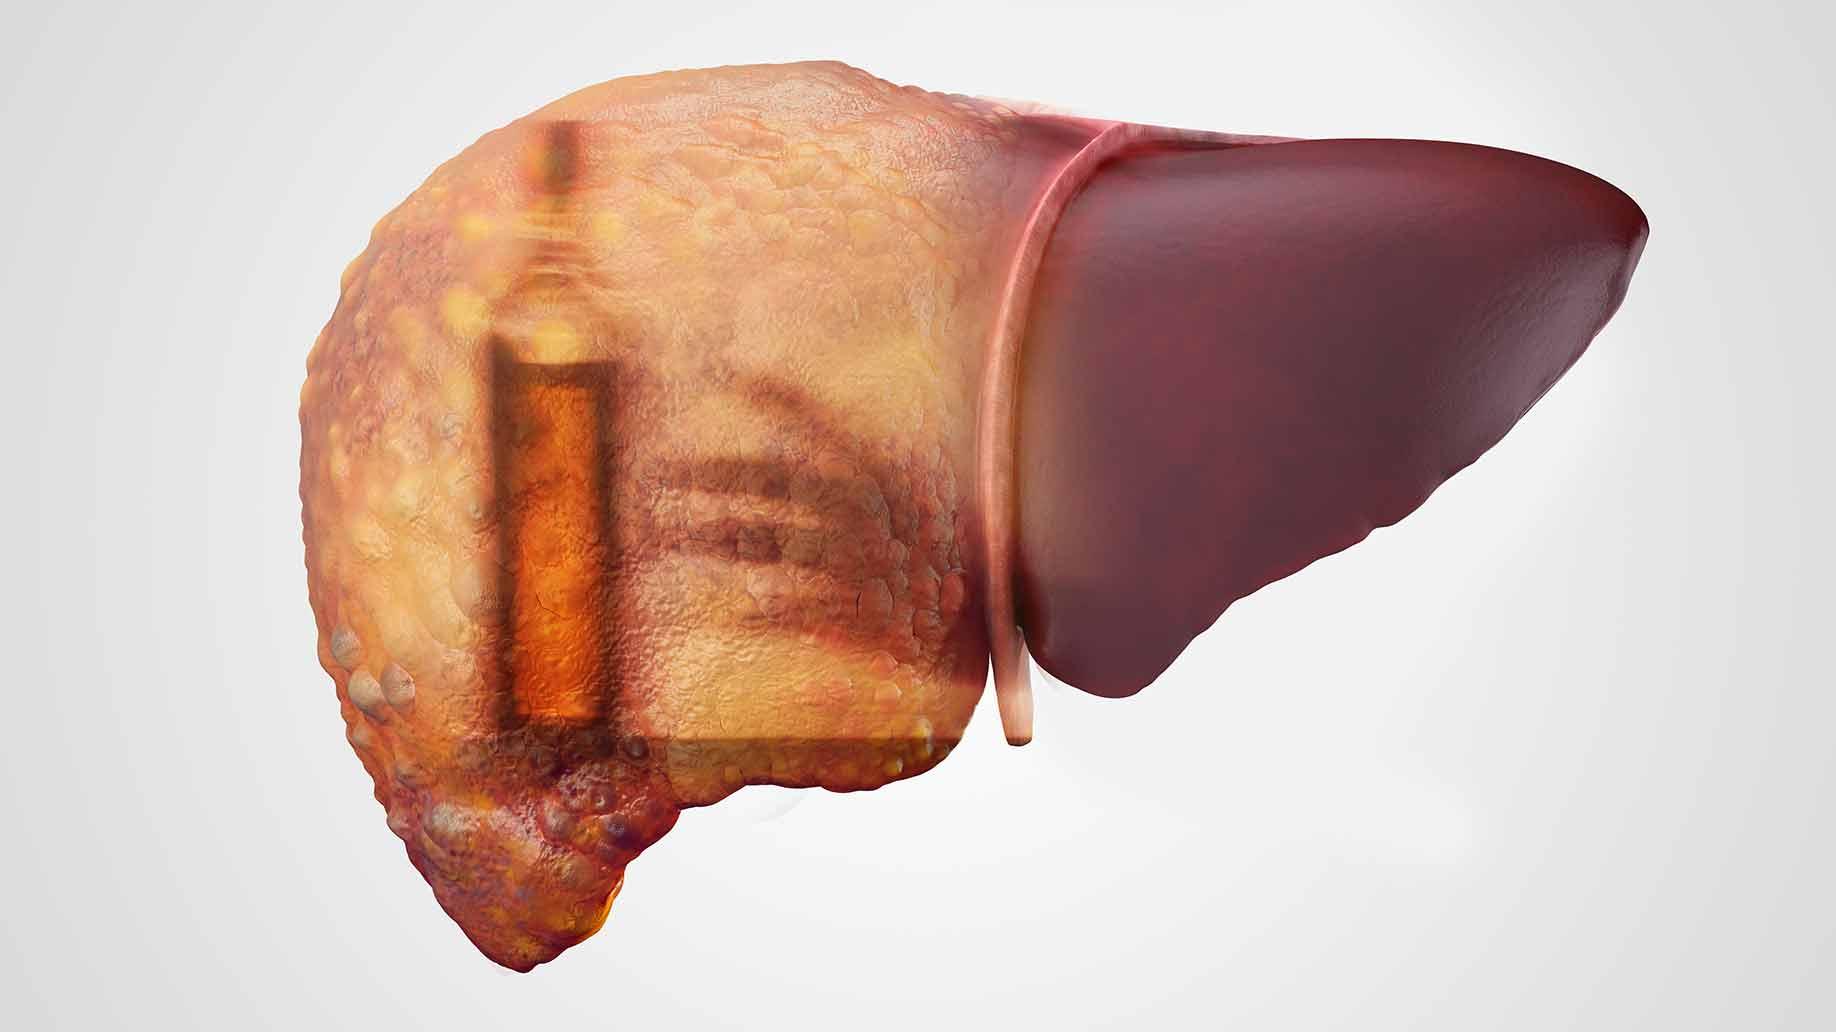 coffee natural benefits cirrhosis alcohol immune hepatitis liver disease health